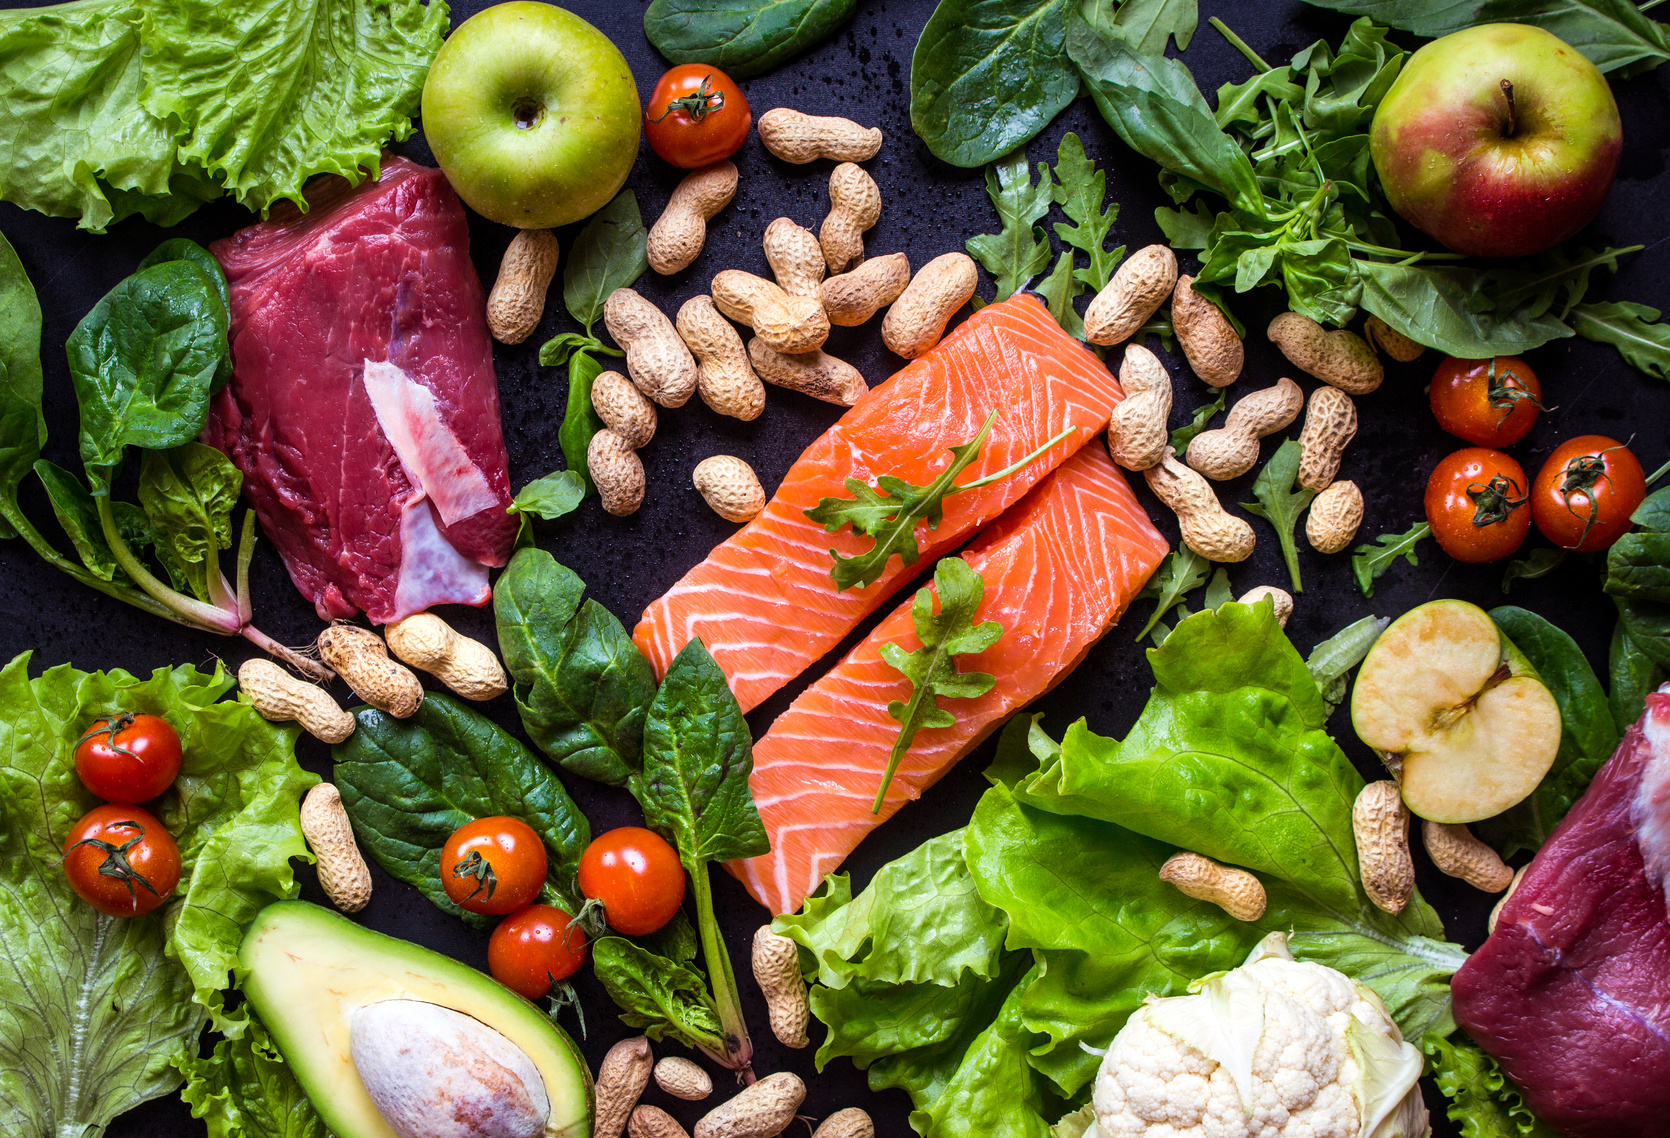 dieta mediterranea in cui consiste